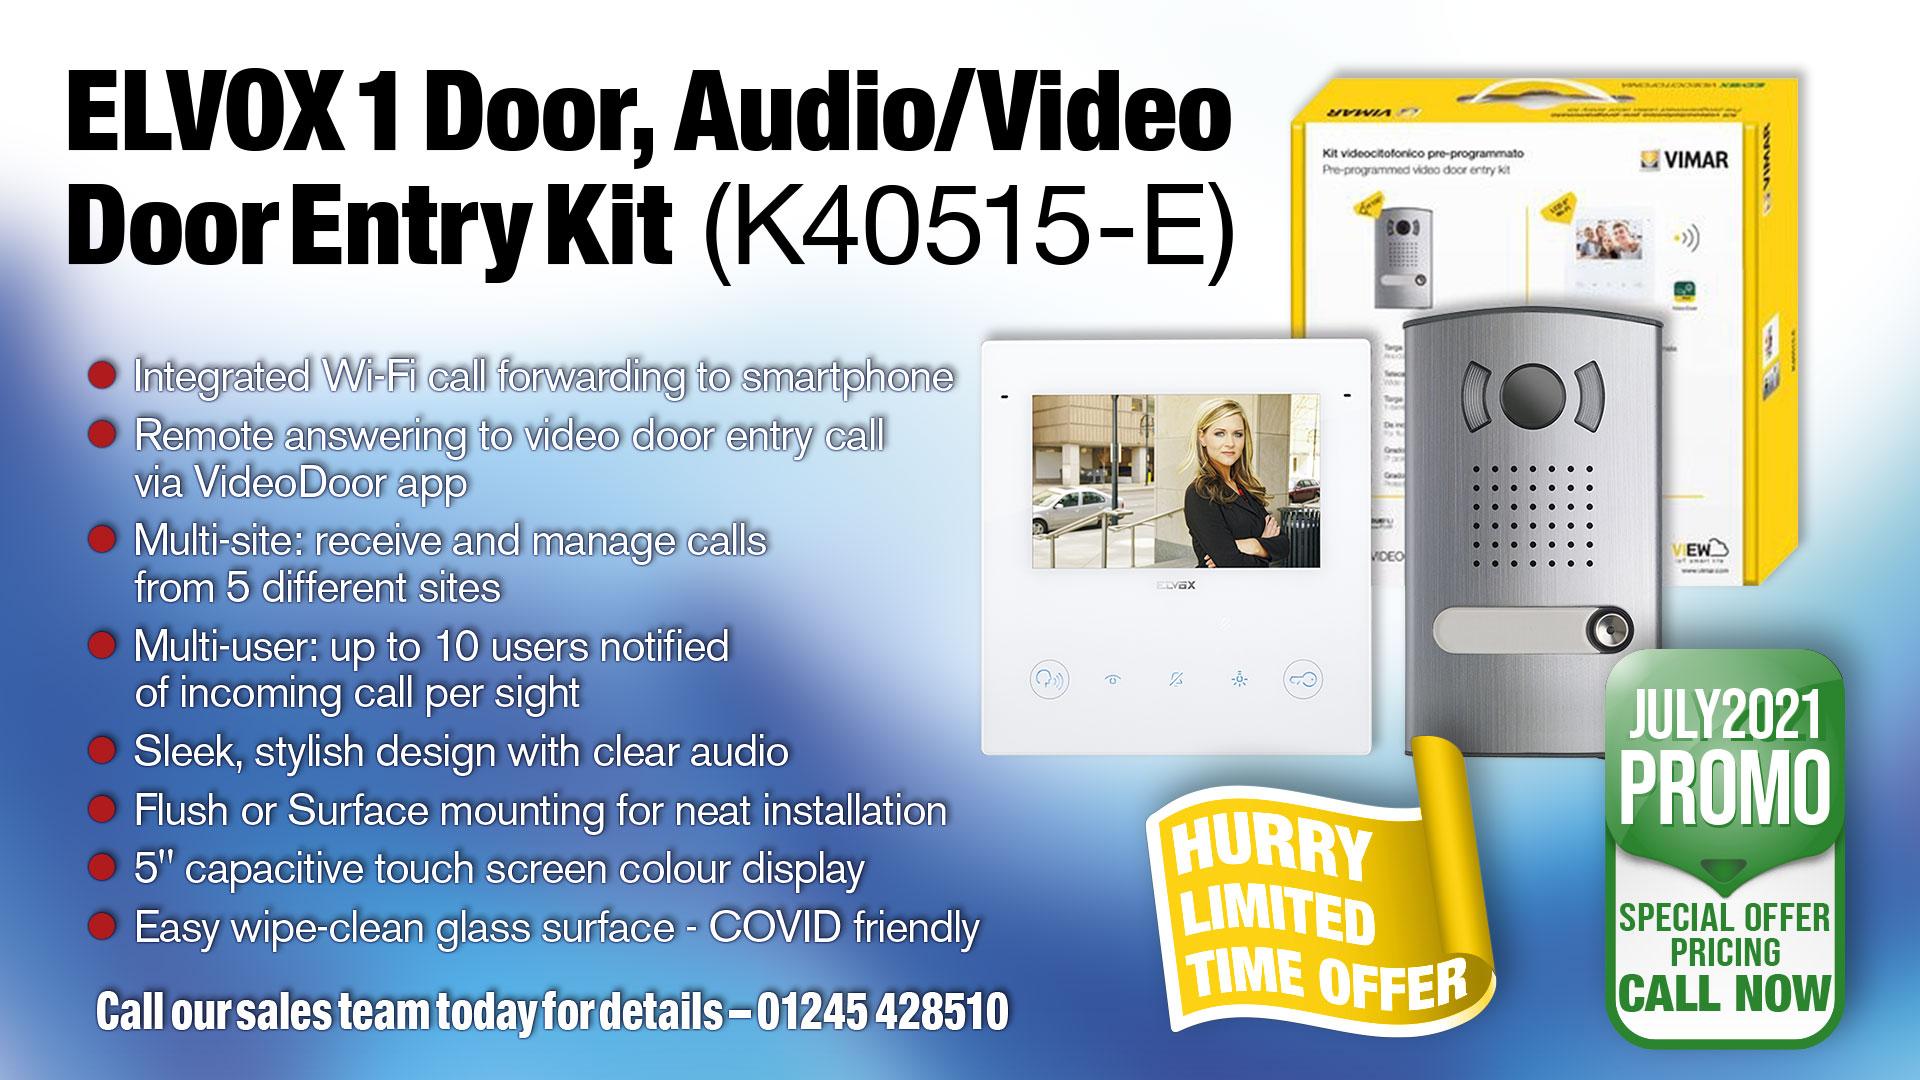 Vimar Elvox Door Entry single entrance video door entry kit K40515-E